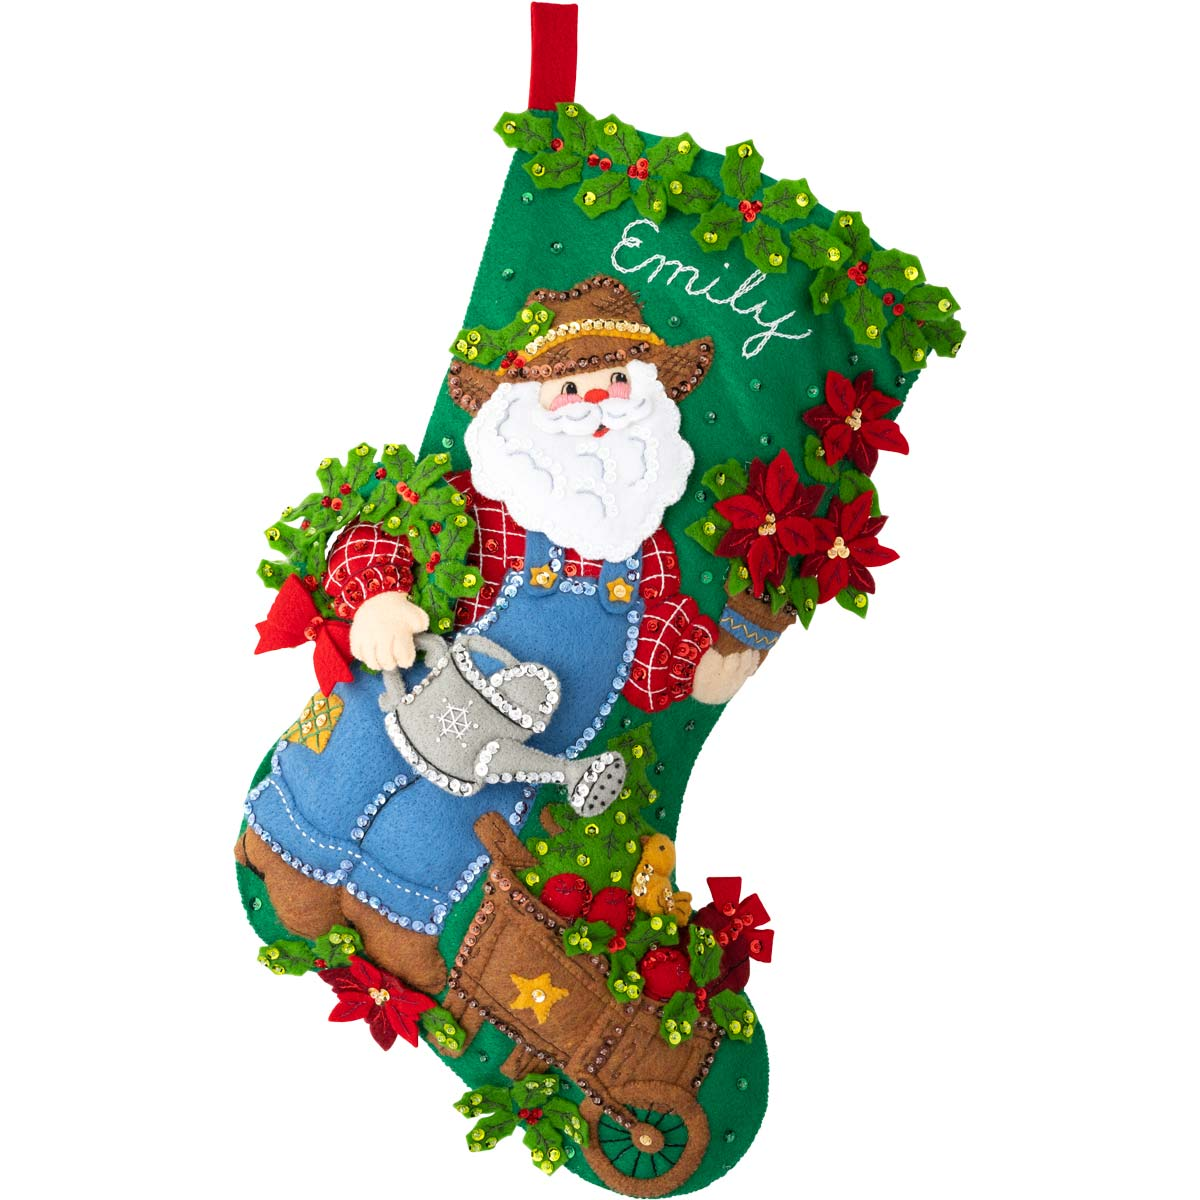 Bucilla ® Seasonal - Felt - Stocking Kits - In The Garden - 89334E